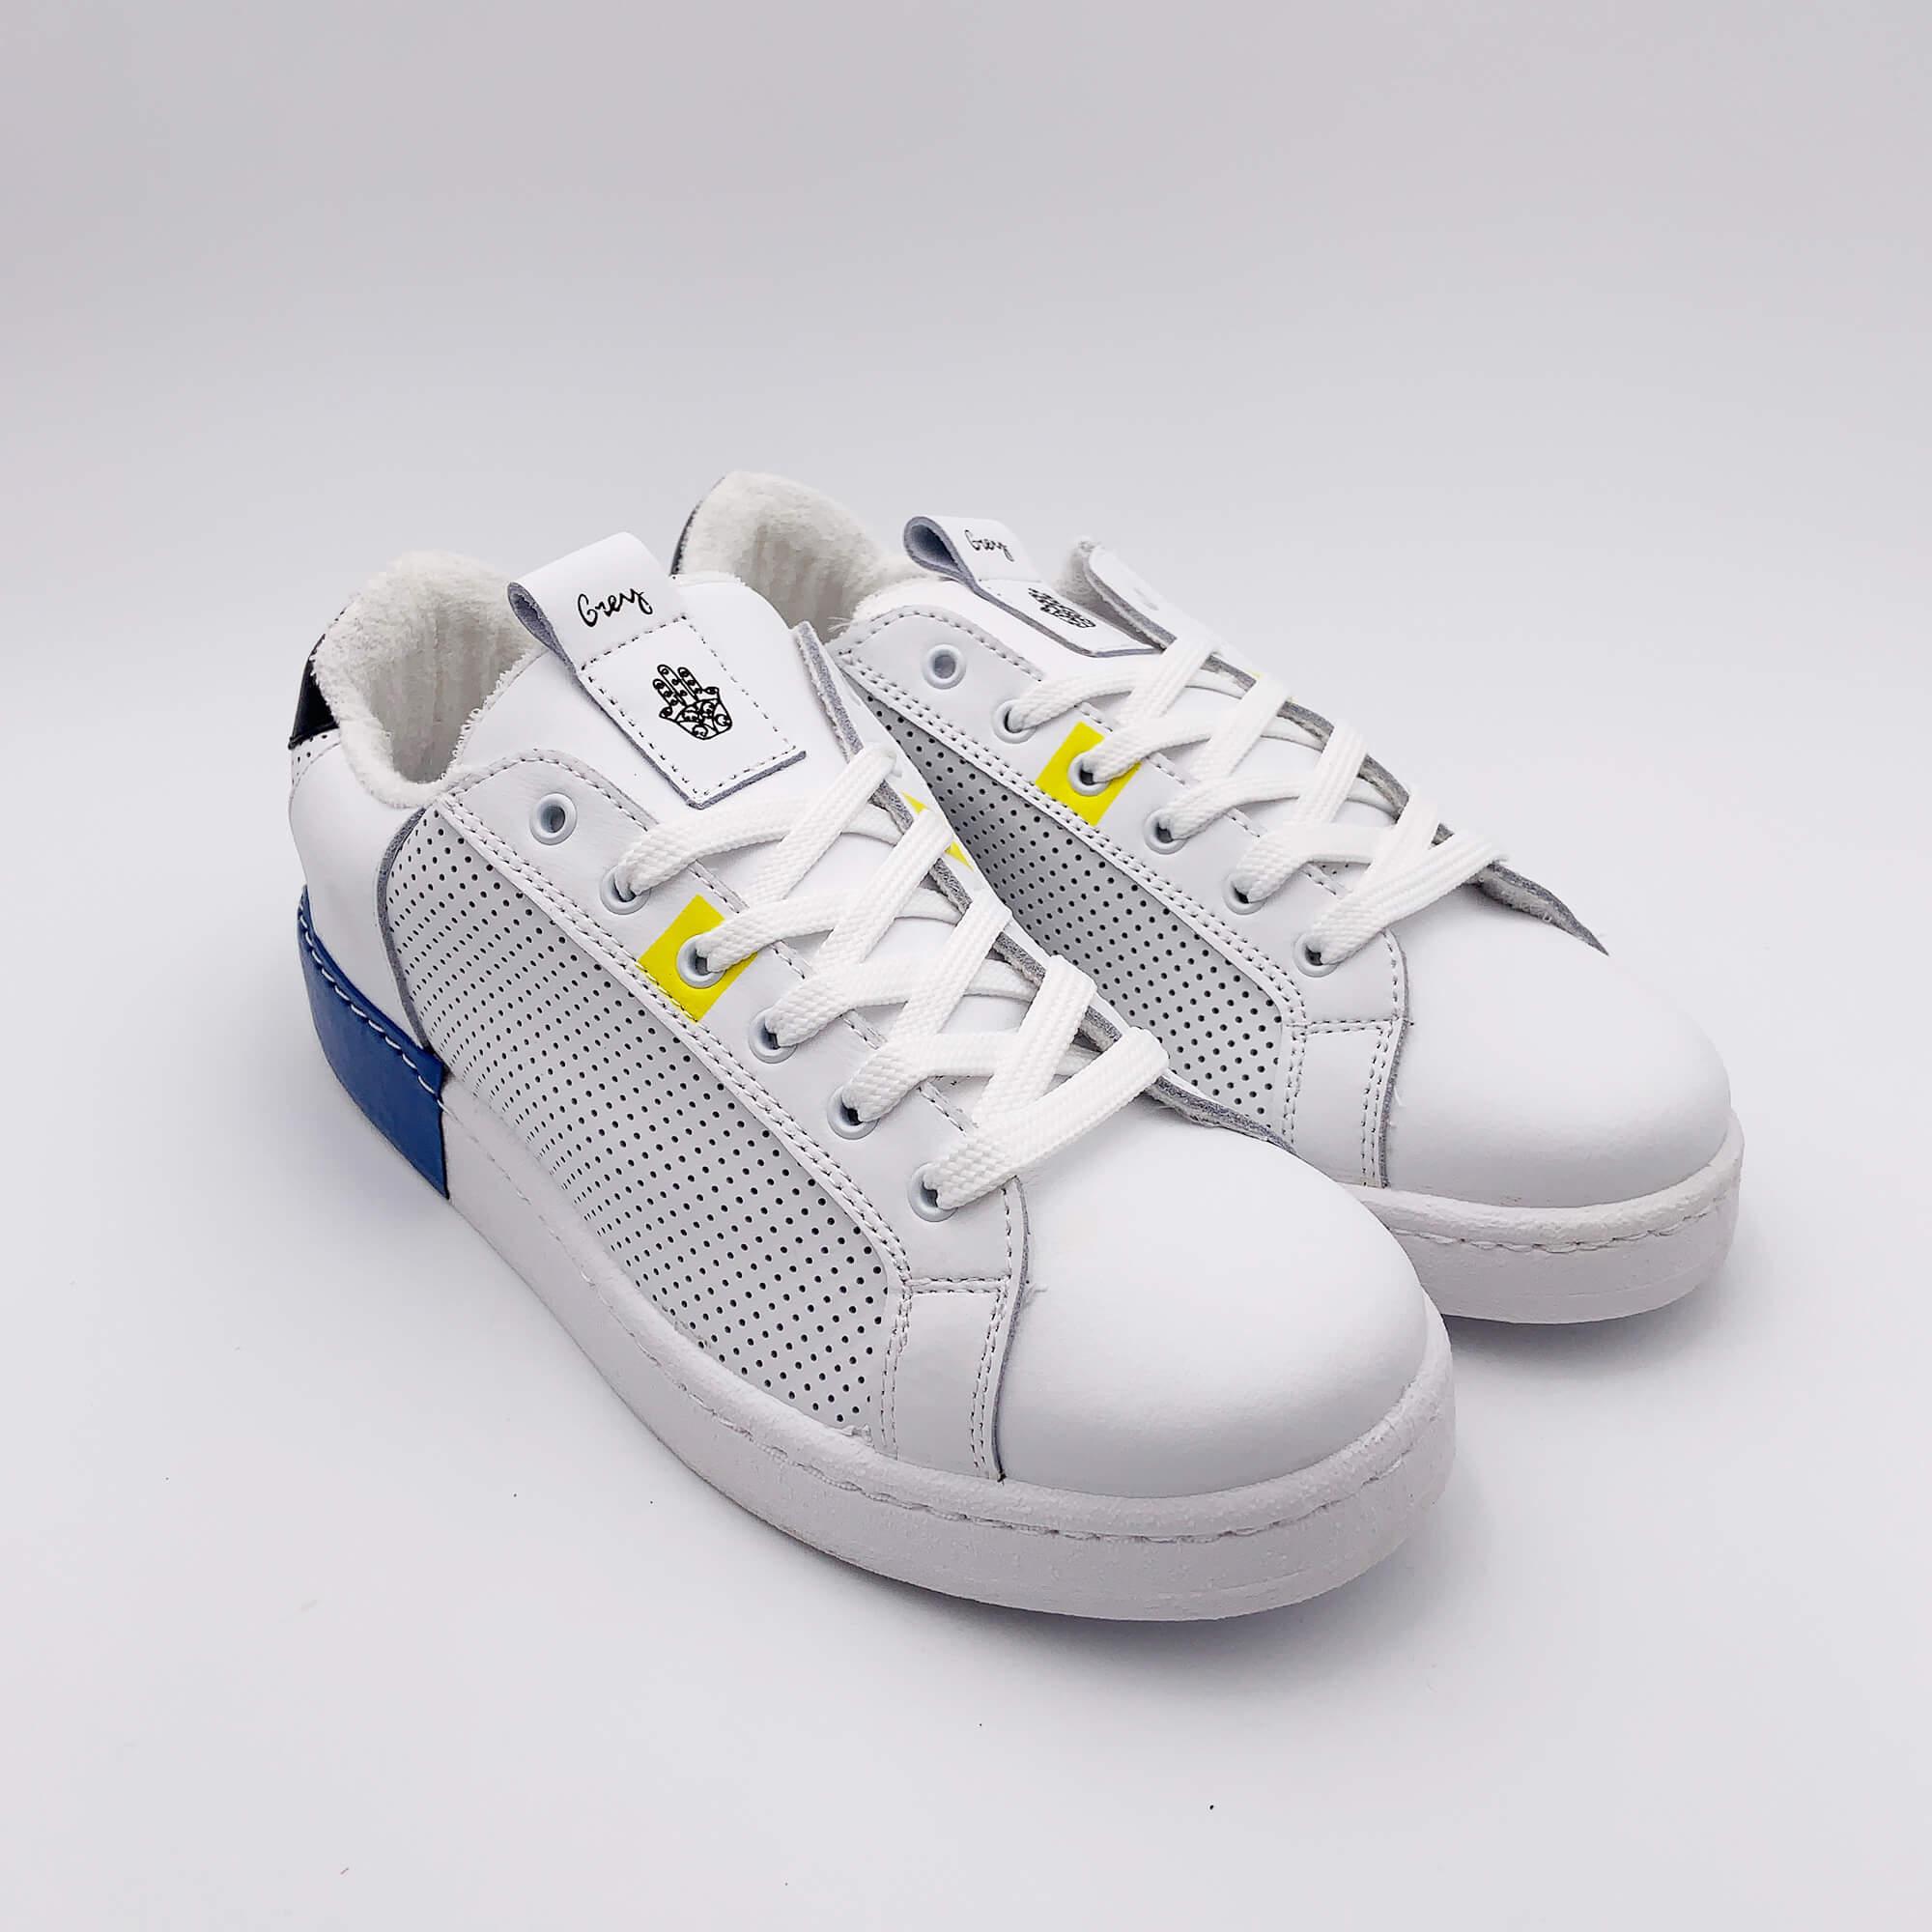 Sneakers in pelle traforata - Bianco